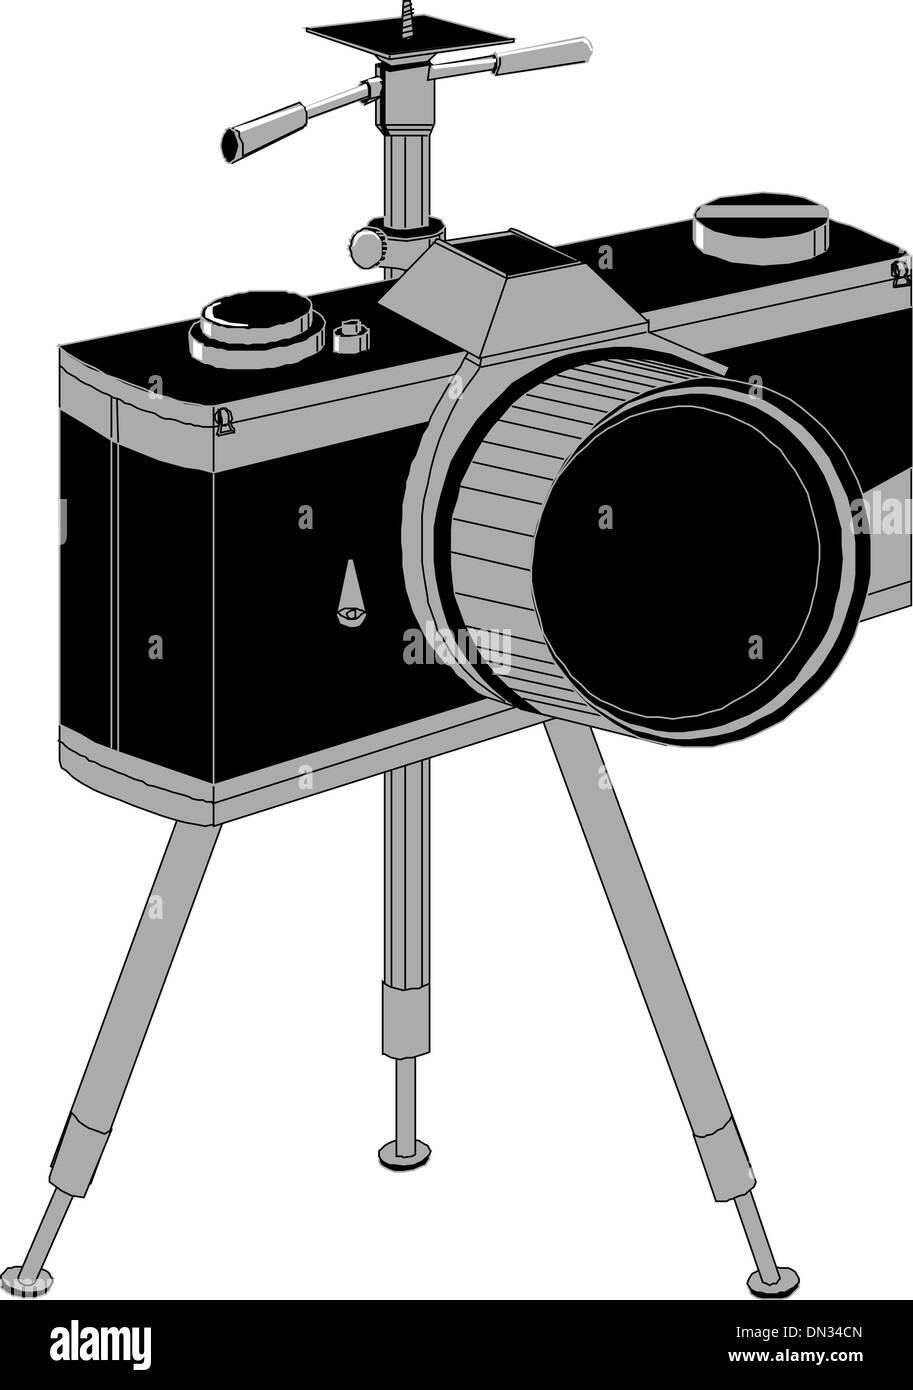 Professional slr camera - Stock Vector